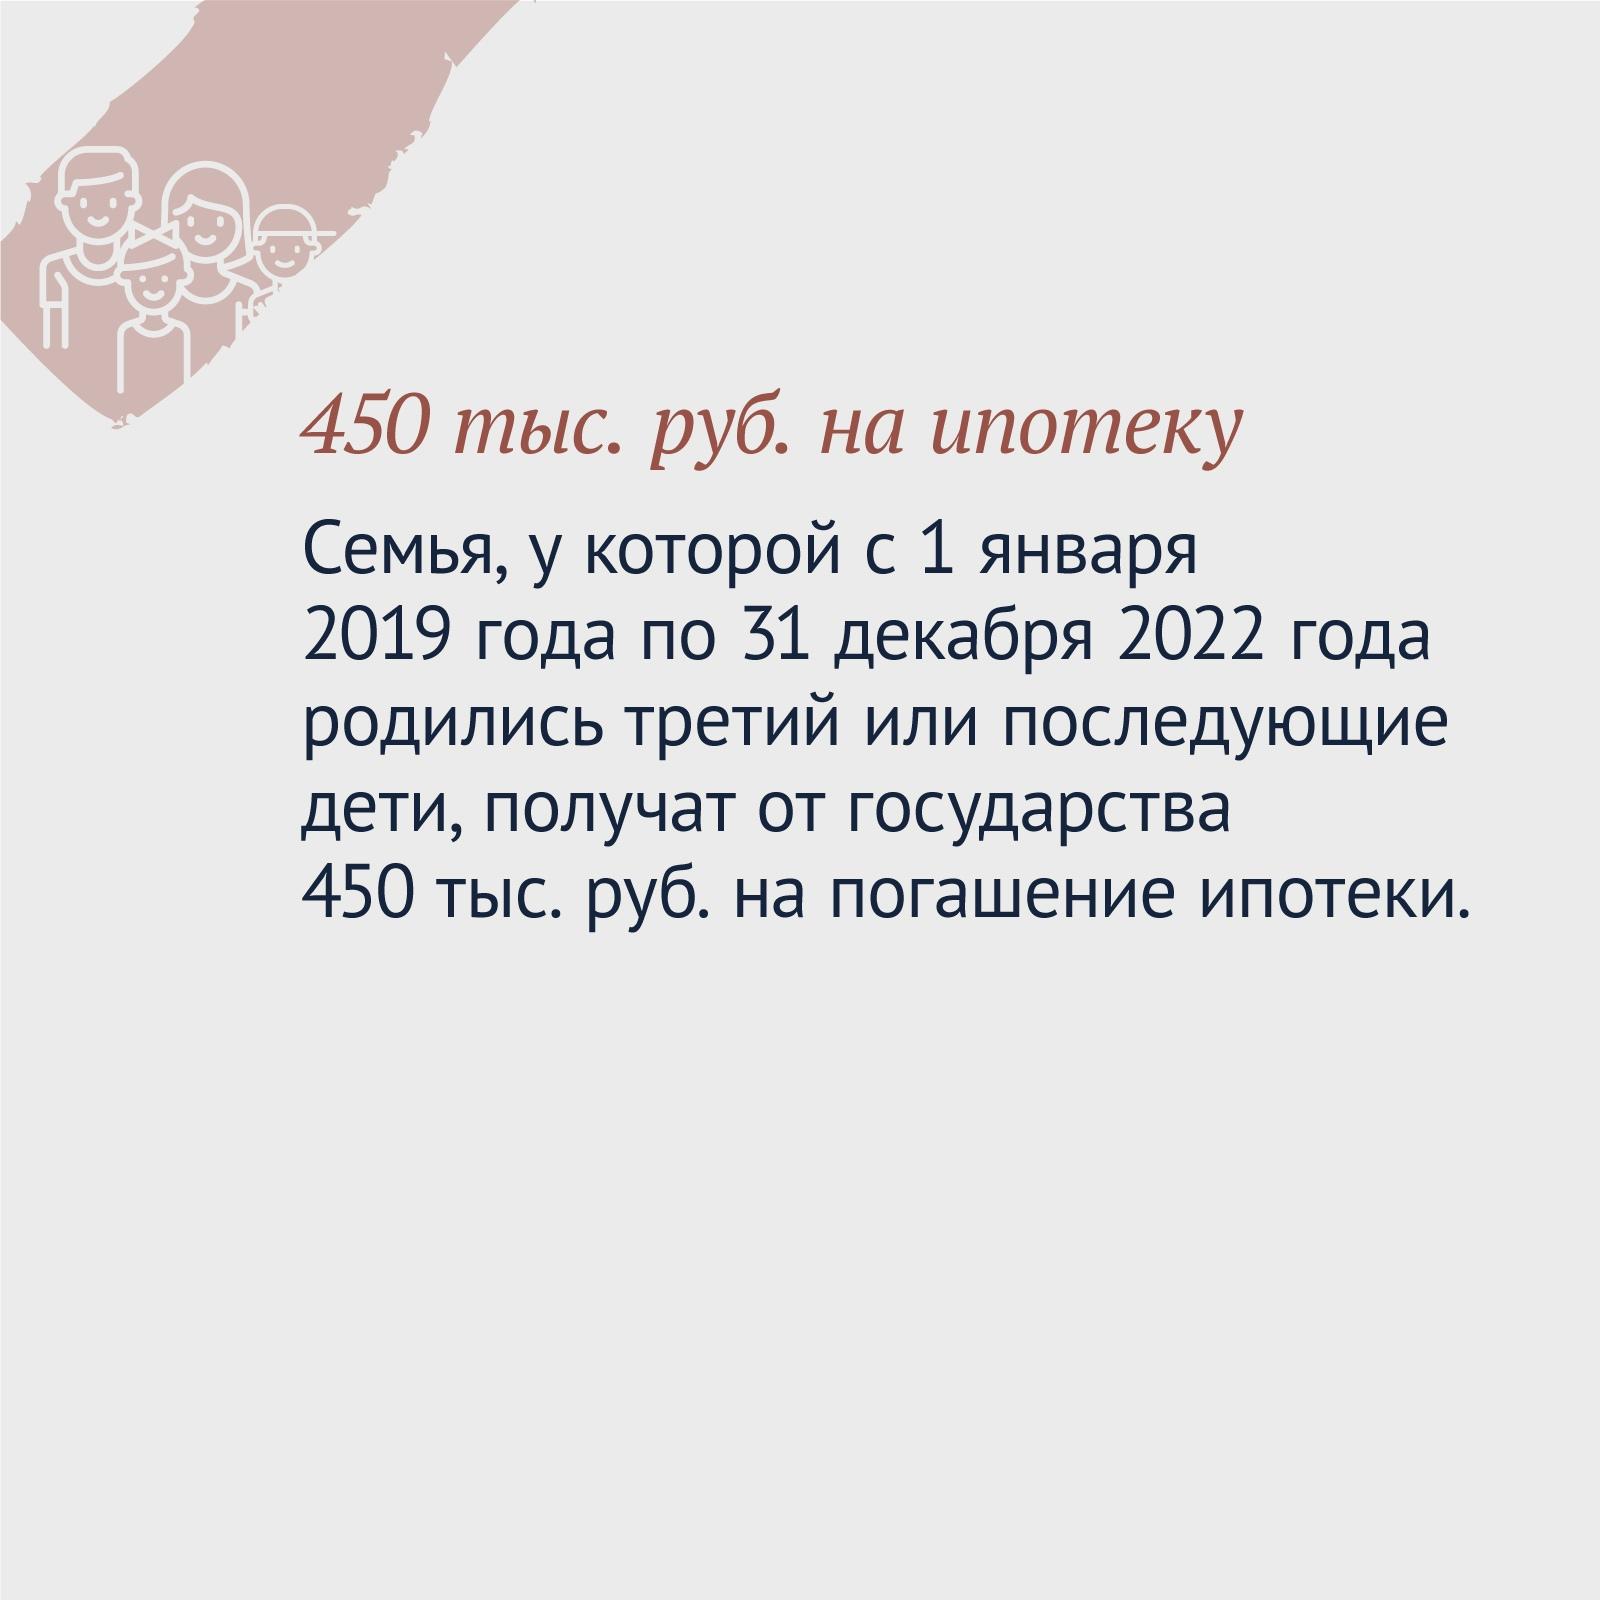 https://sun7-9.userapi.com/c858032/v858032646/16a500/inH0qEpFNK4.jpg